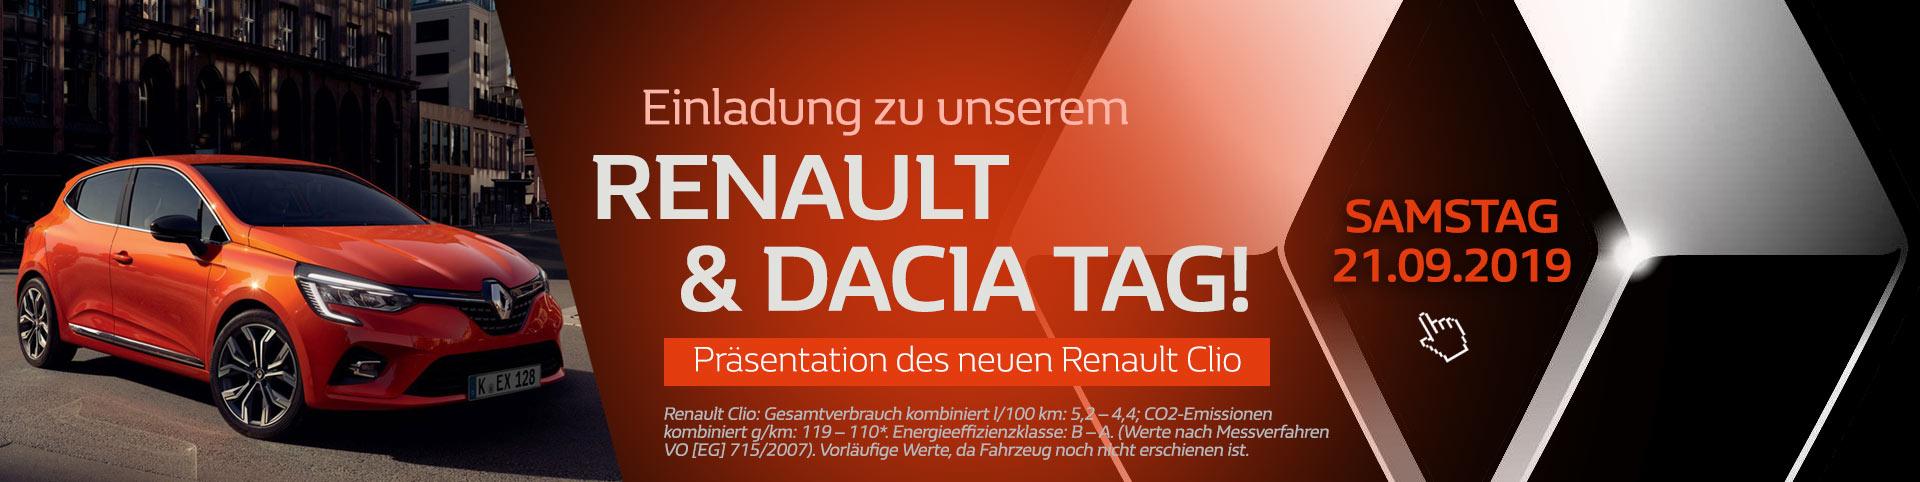 Renault Tag mit dem neuen Renault Clio